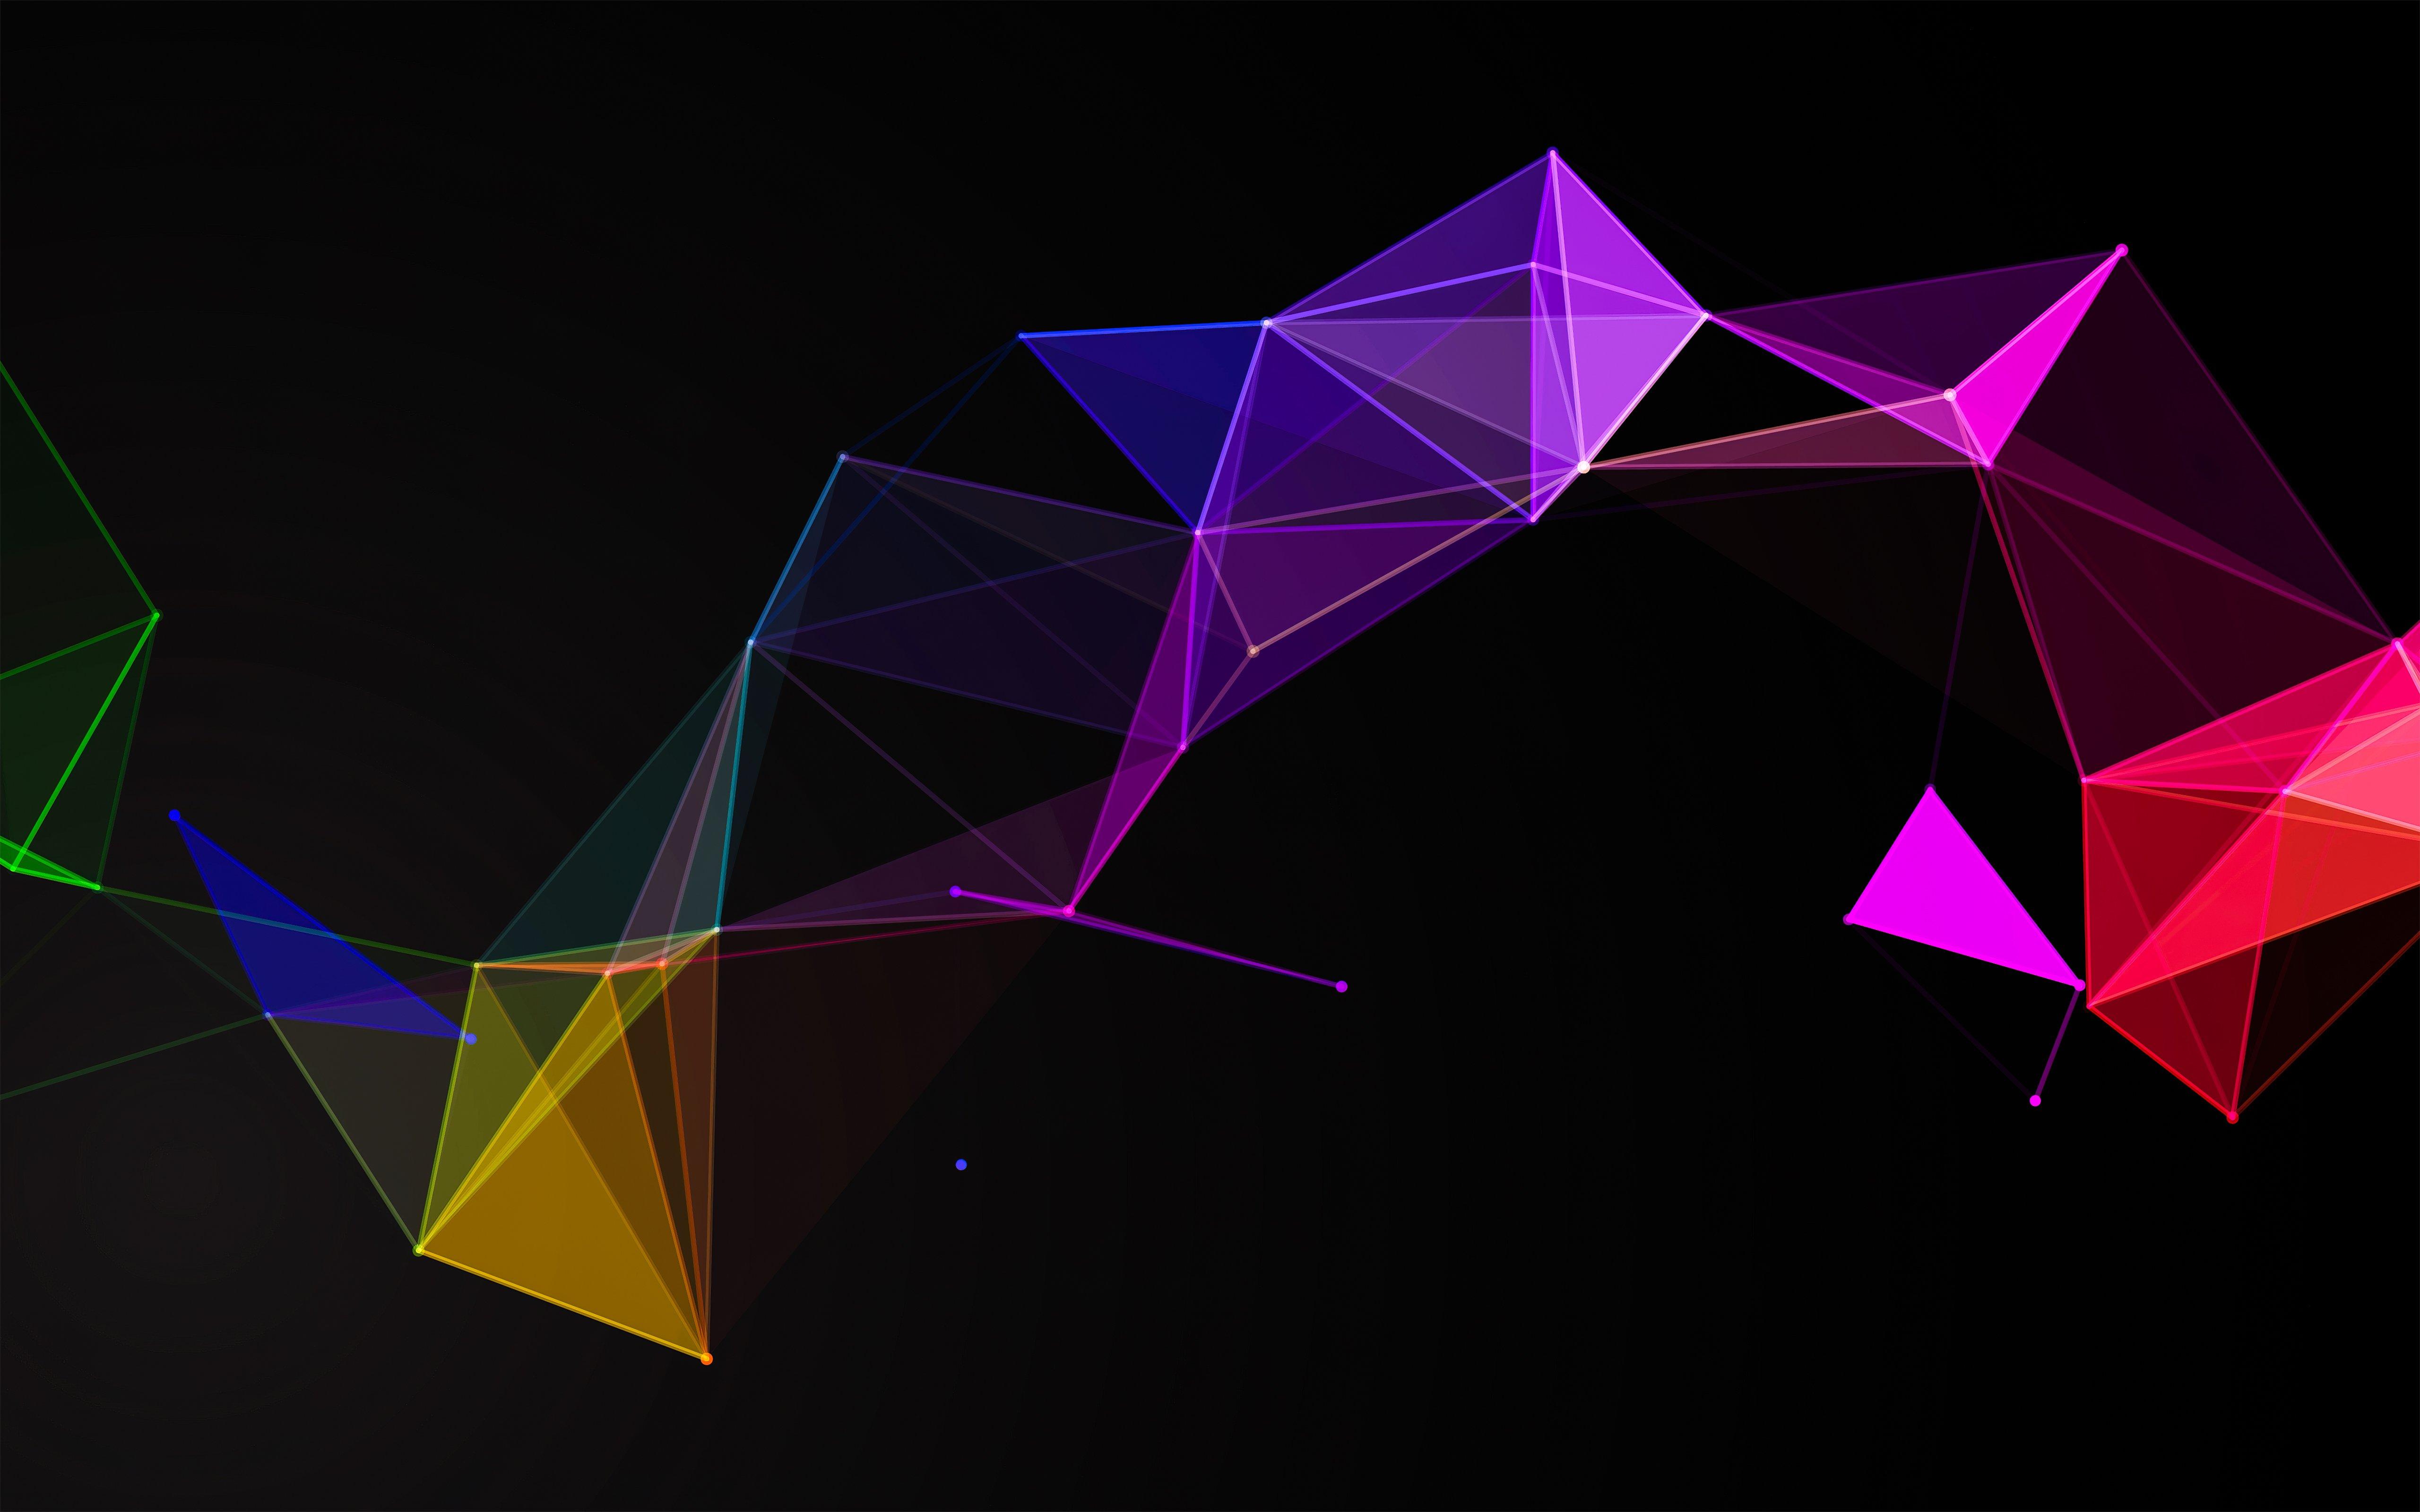 Fondos de pantalla Figuras geometricas en bucle